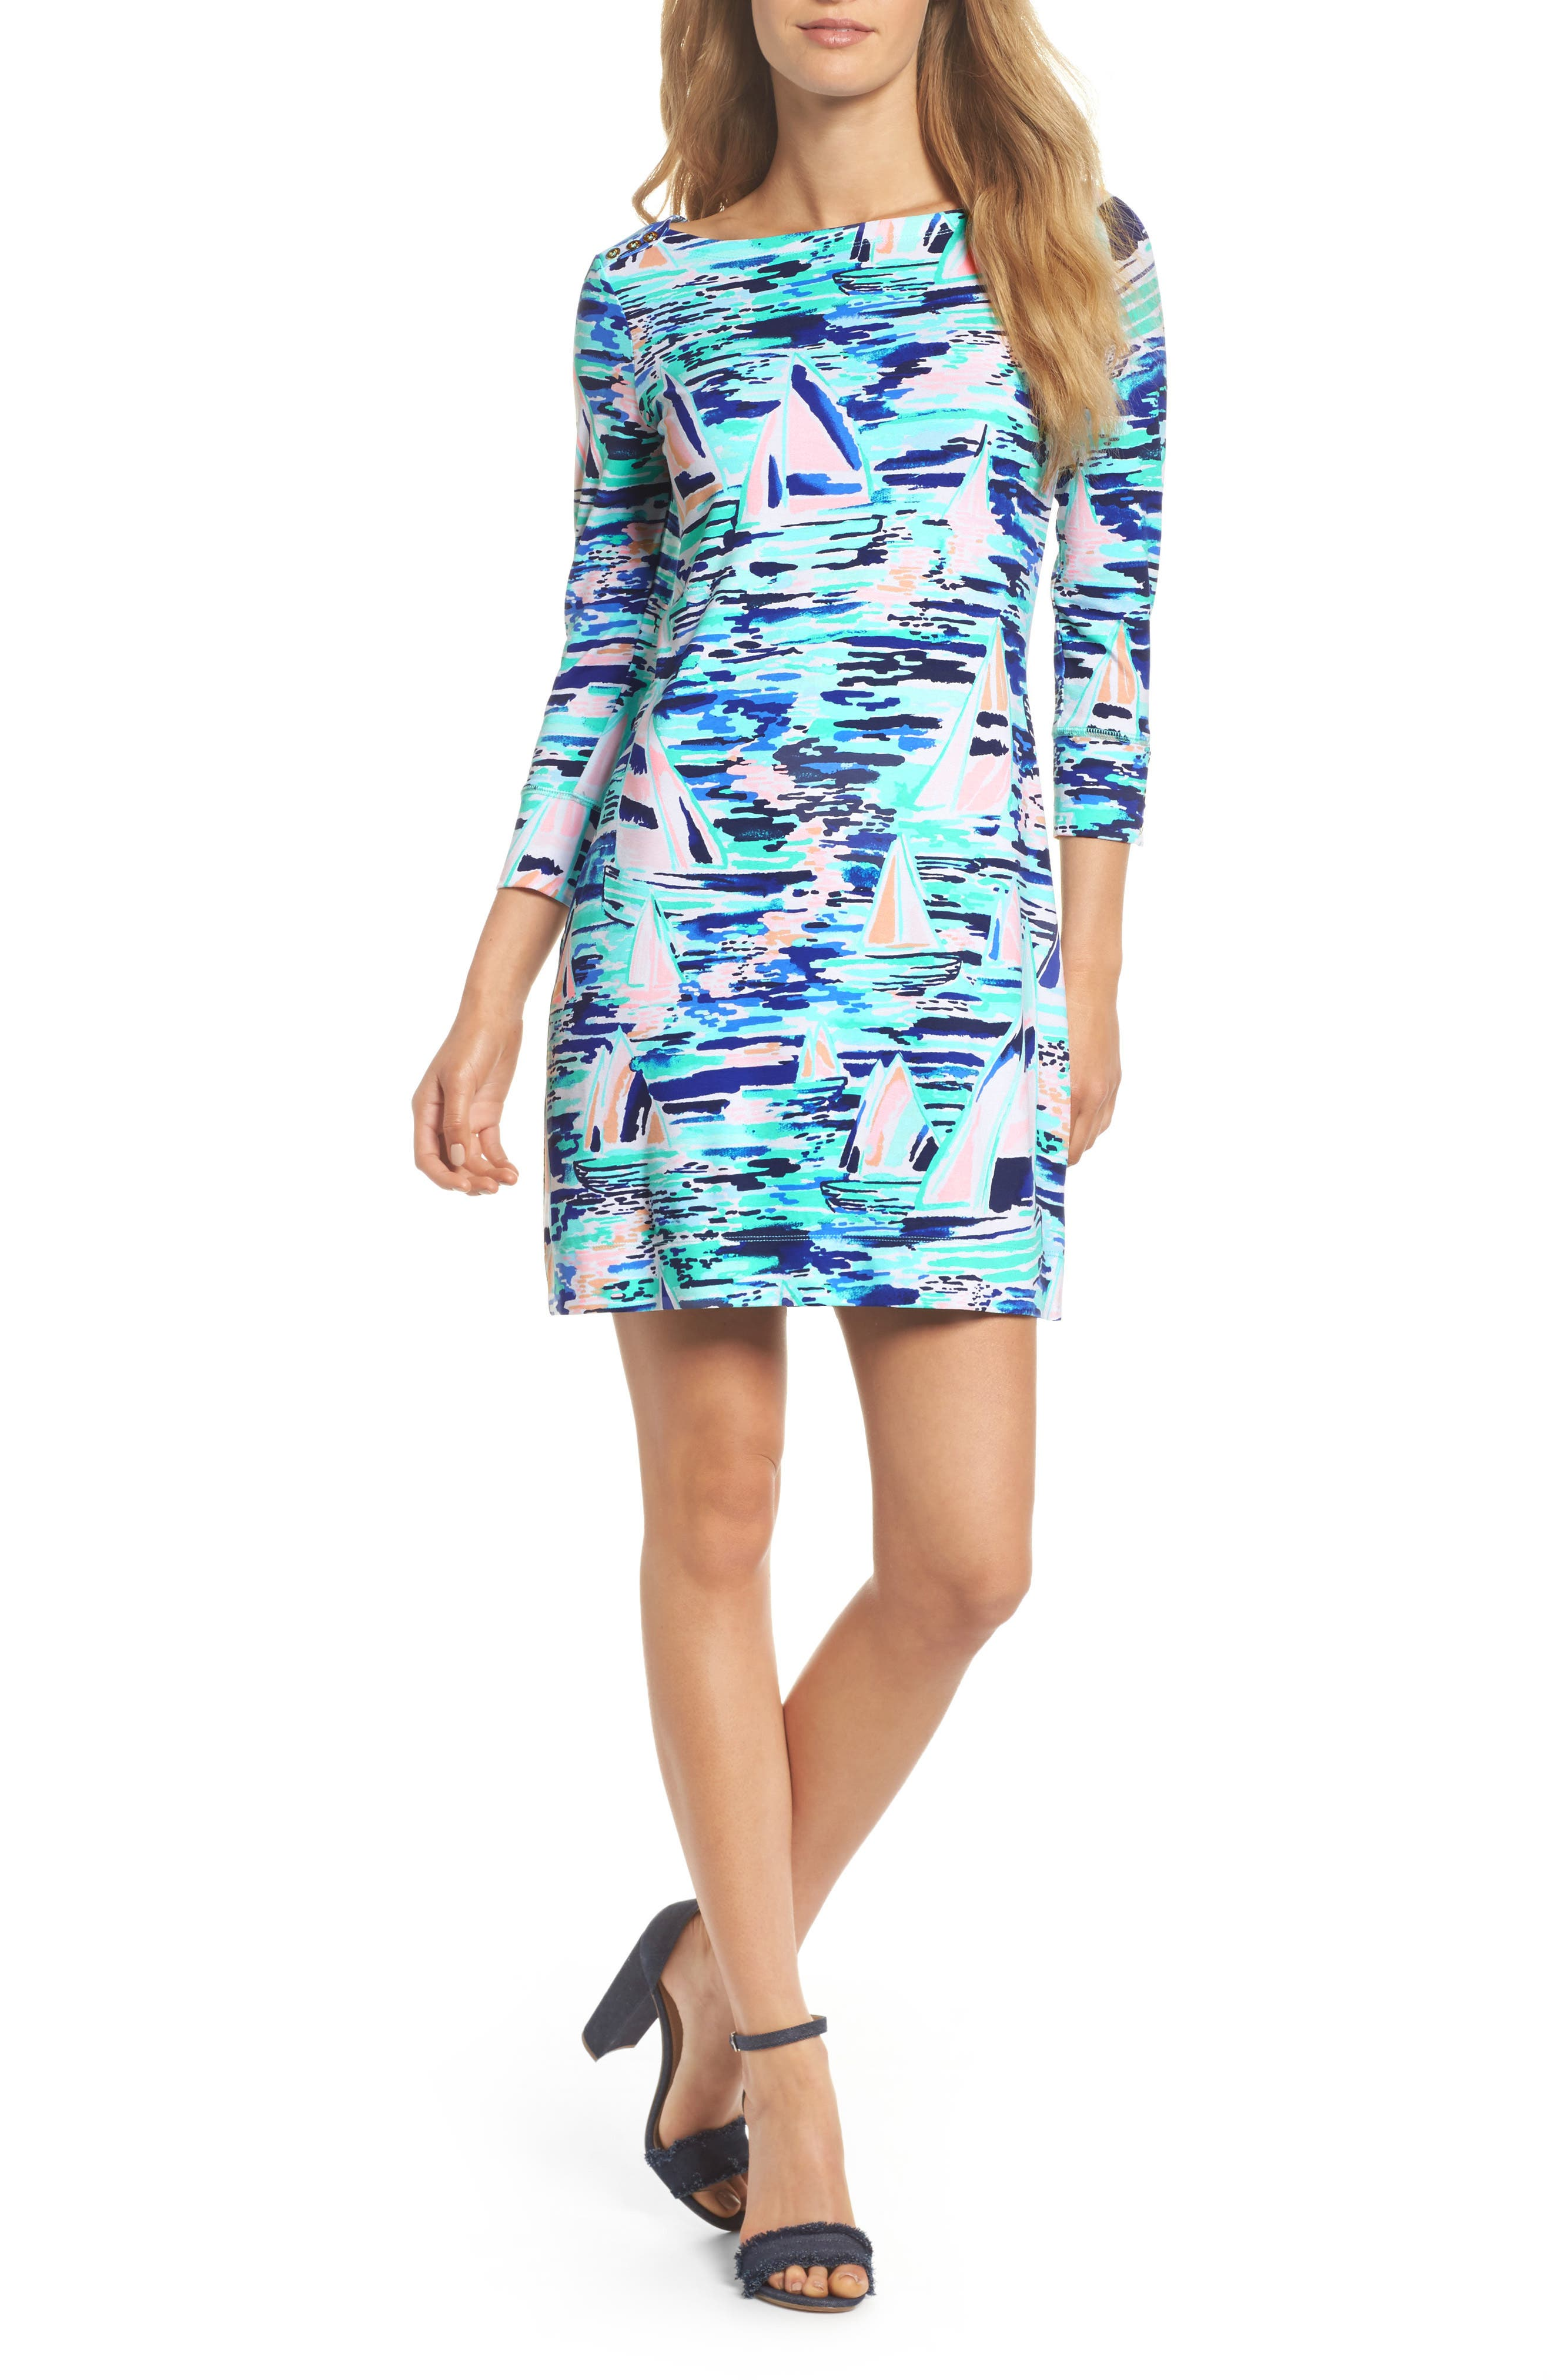 Sophie UPF 50+ Dress,                         Main,                         color, Multi Pier Pressure